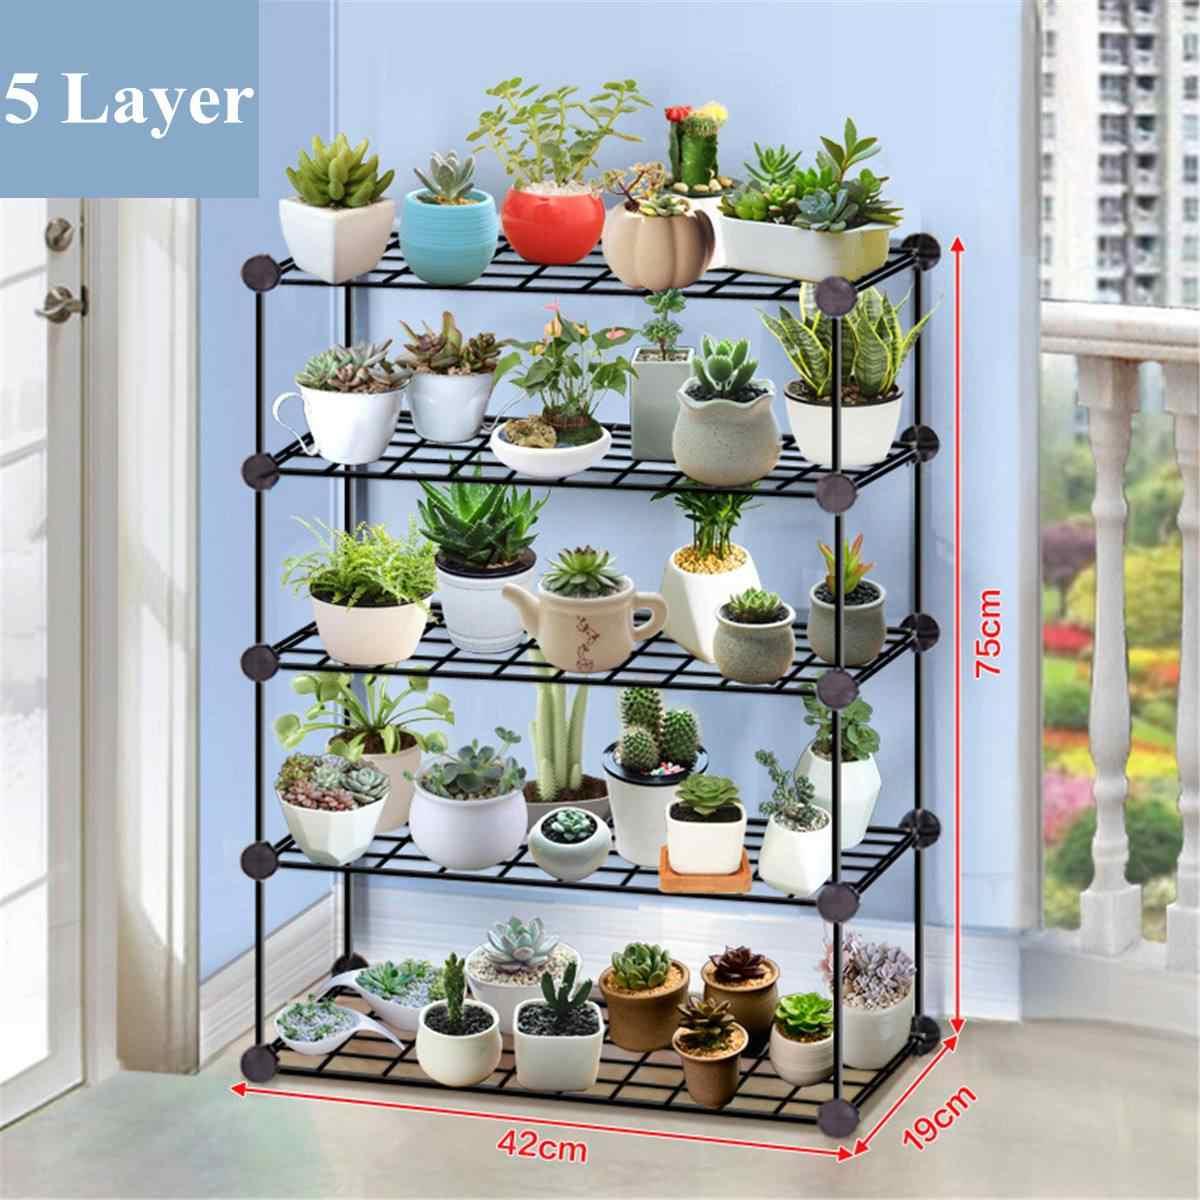 Casa de ferro forjado multi-camada planta estande suculenta prateleira rack varanda simples interior barra de café jardim vaso de flores prateleira